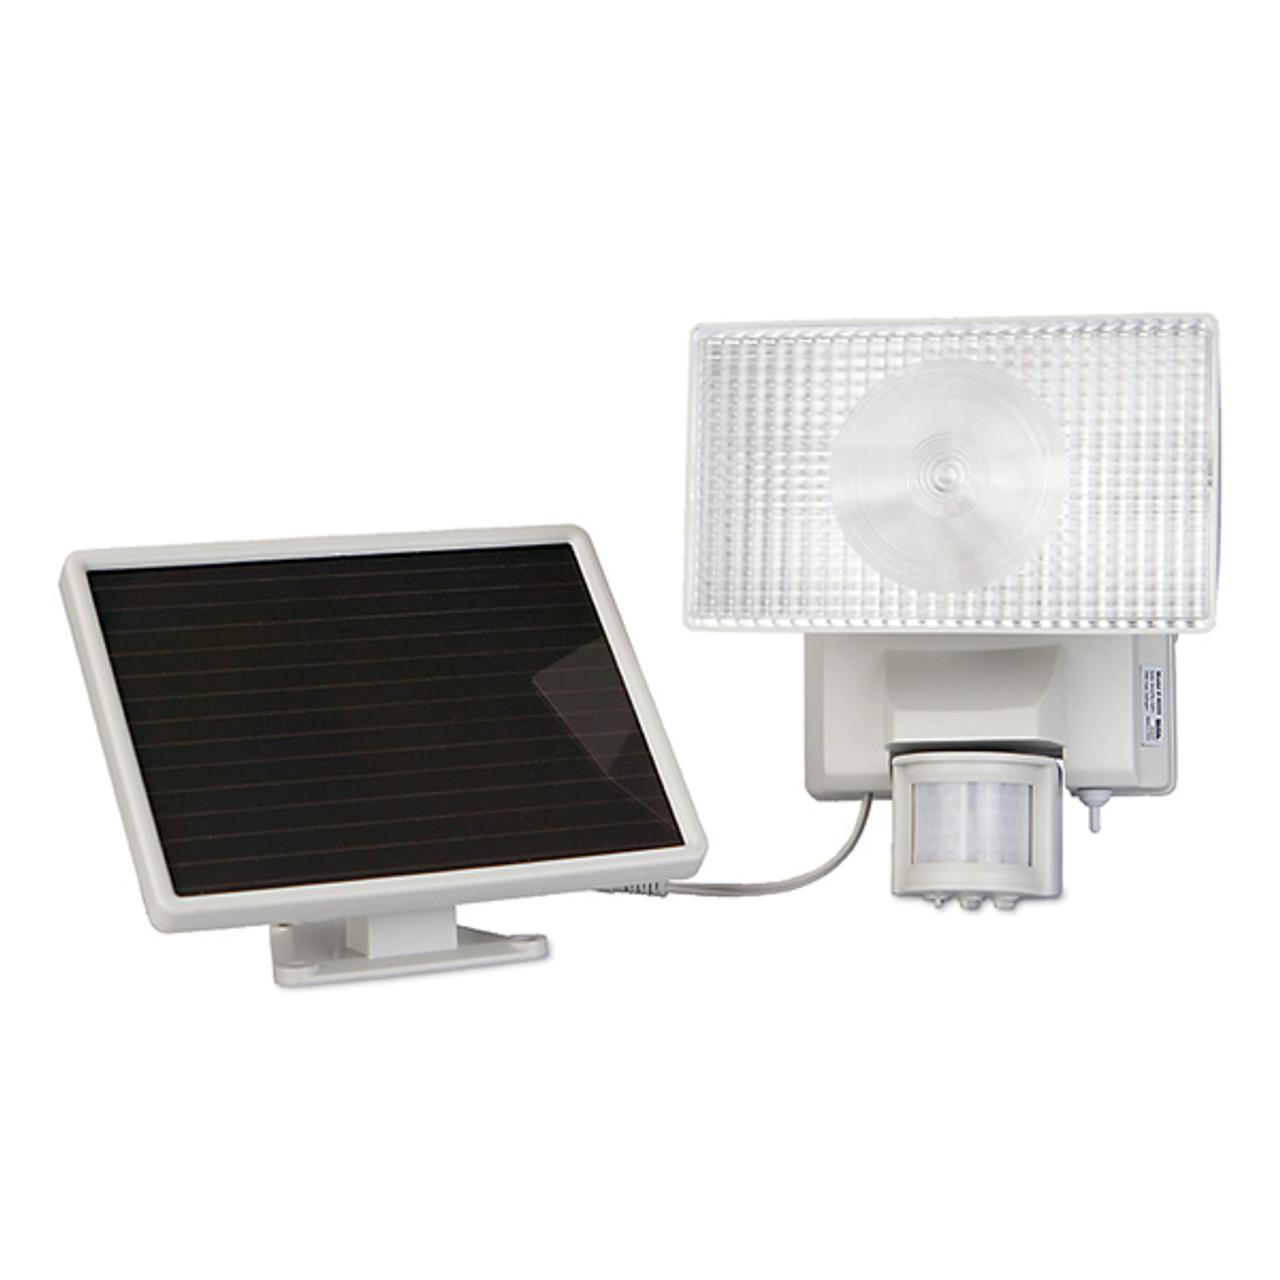 Solar-Powered 30 Watt Motion-Activated Outdoor Security Floodlight